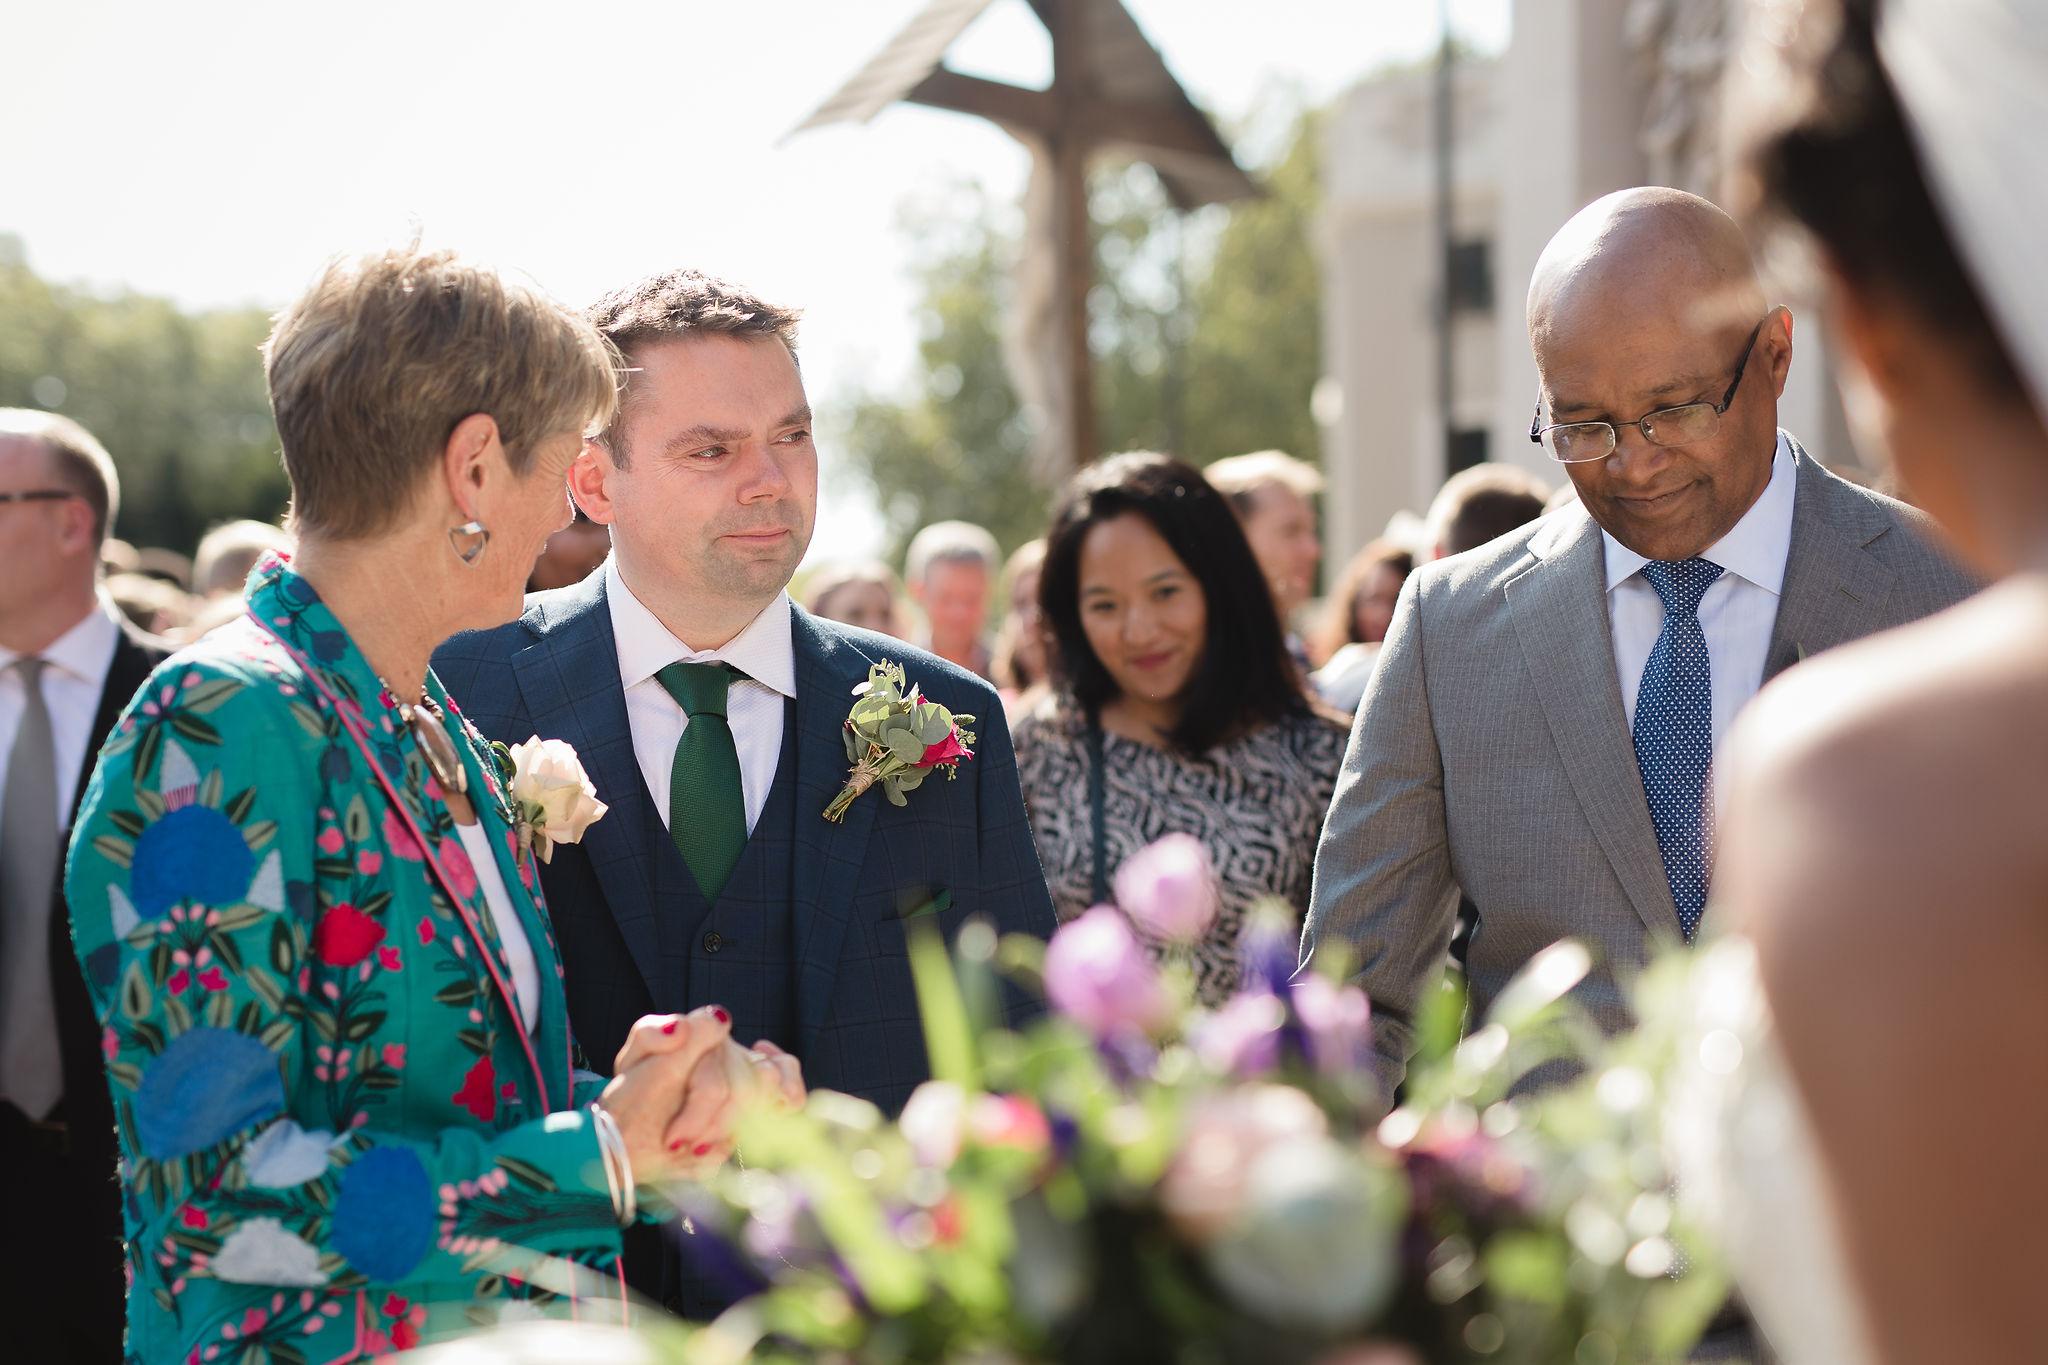 The Anthologist_Drake_and_Morgan_London_Wedding_72.jpg